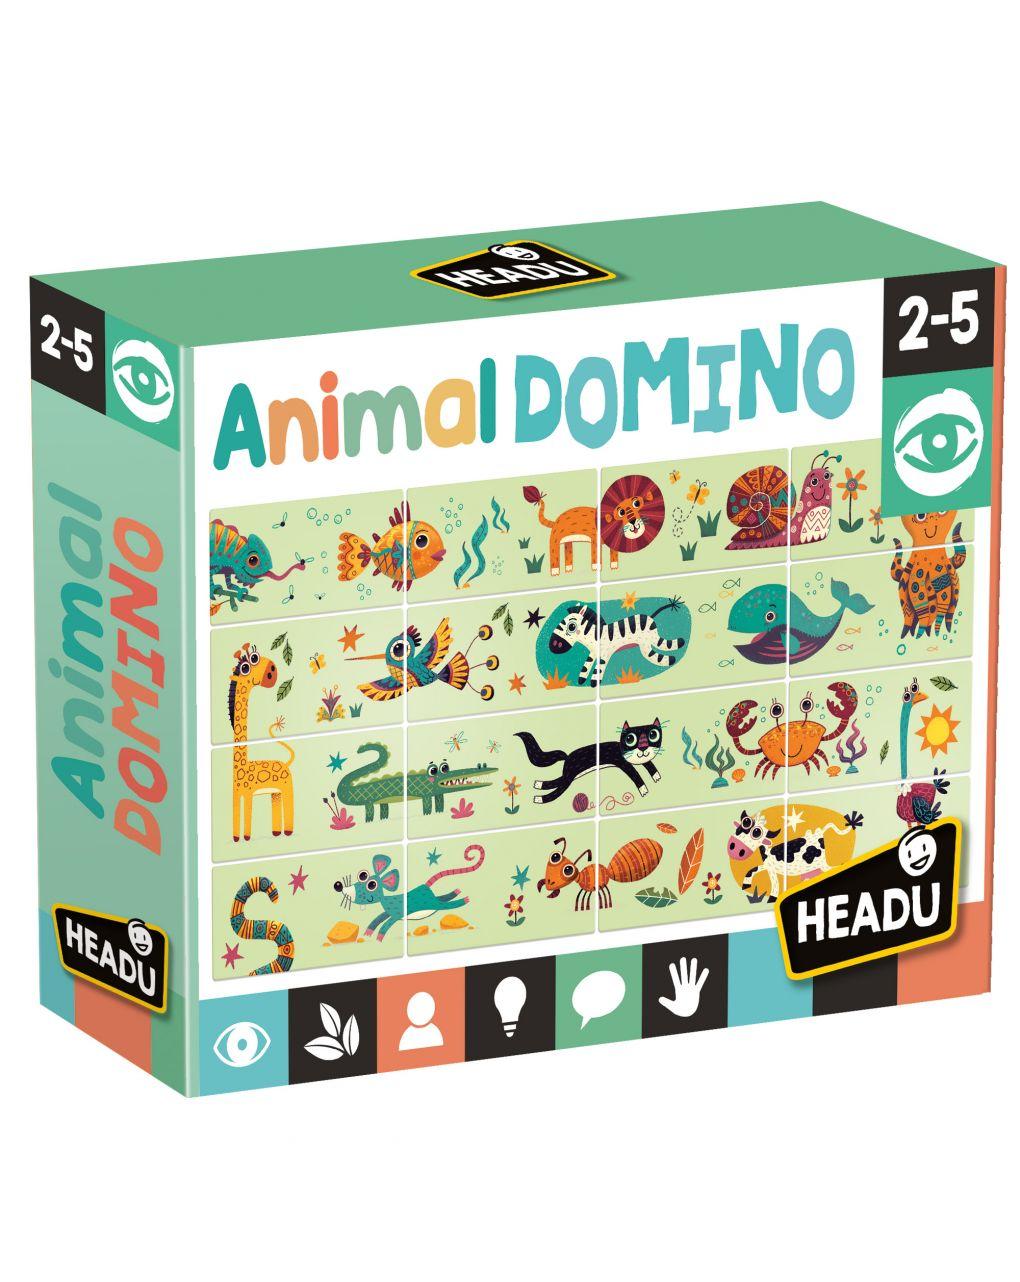 Headu - animal domino - Headu